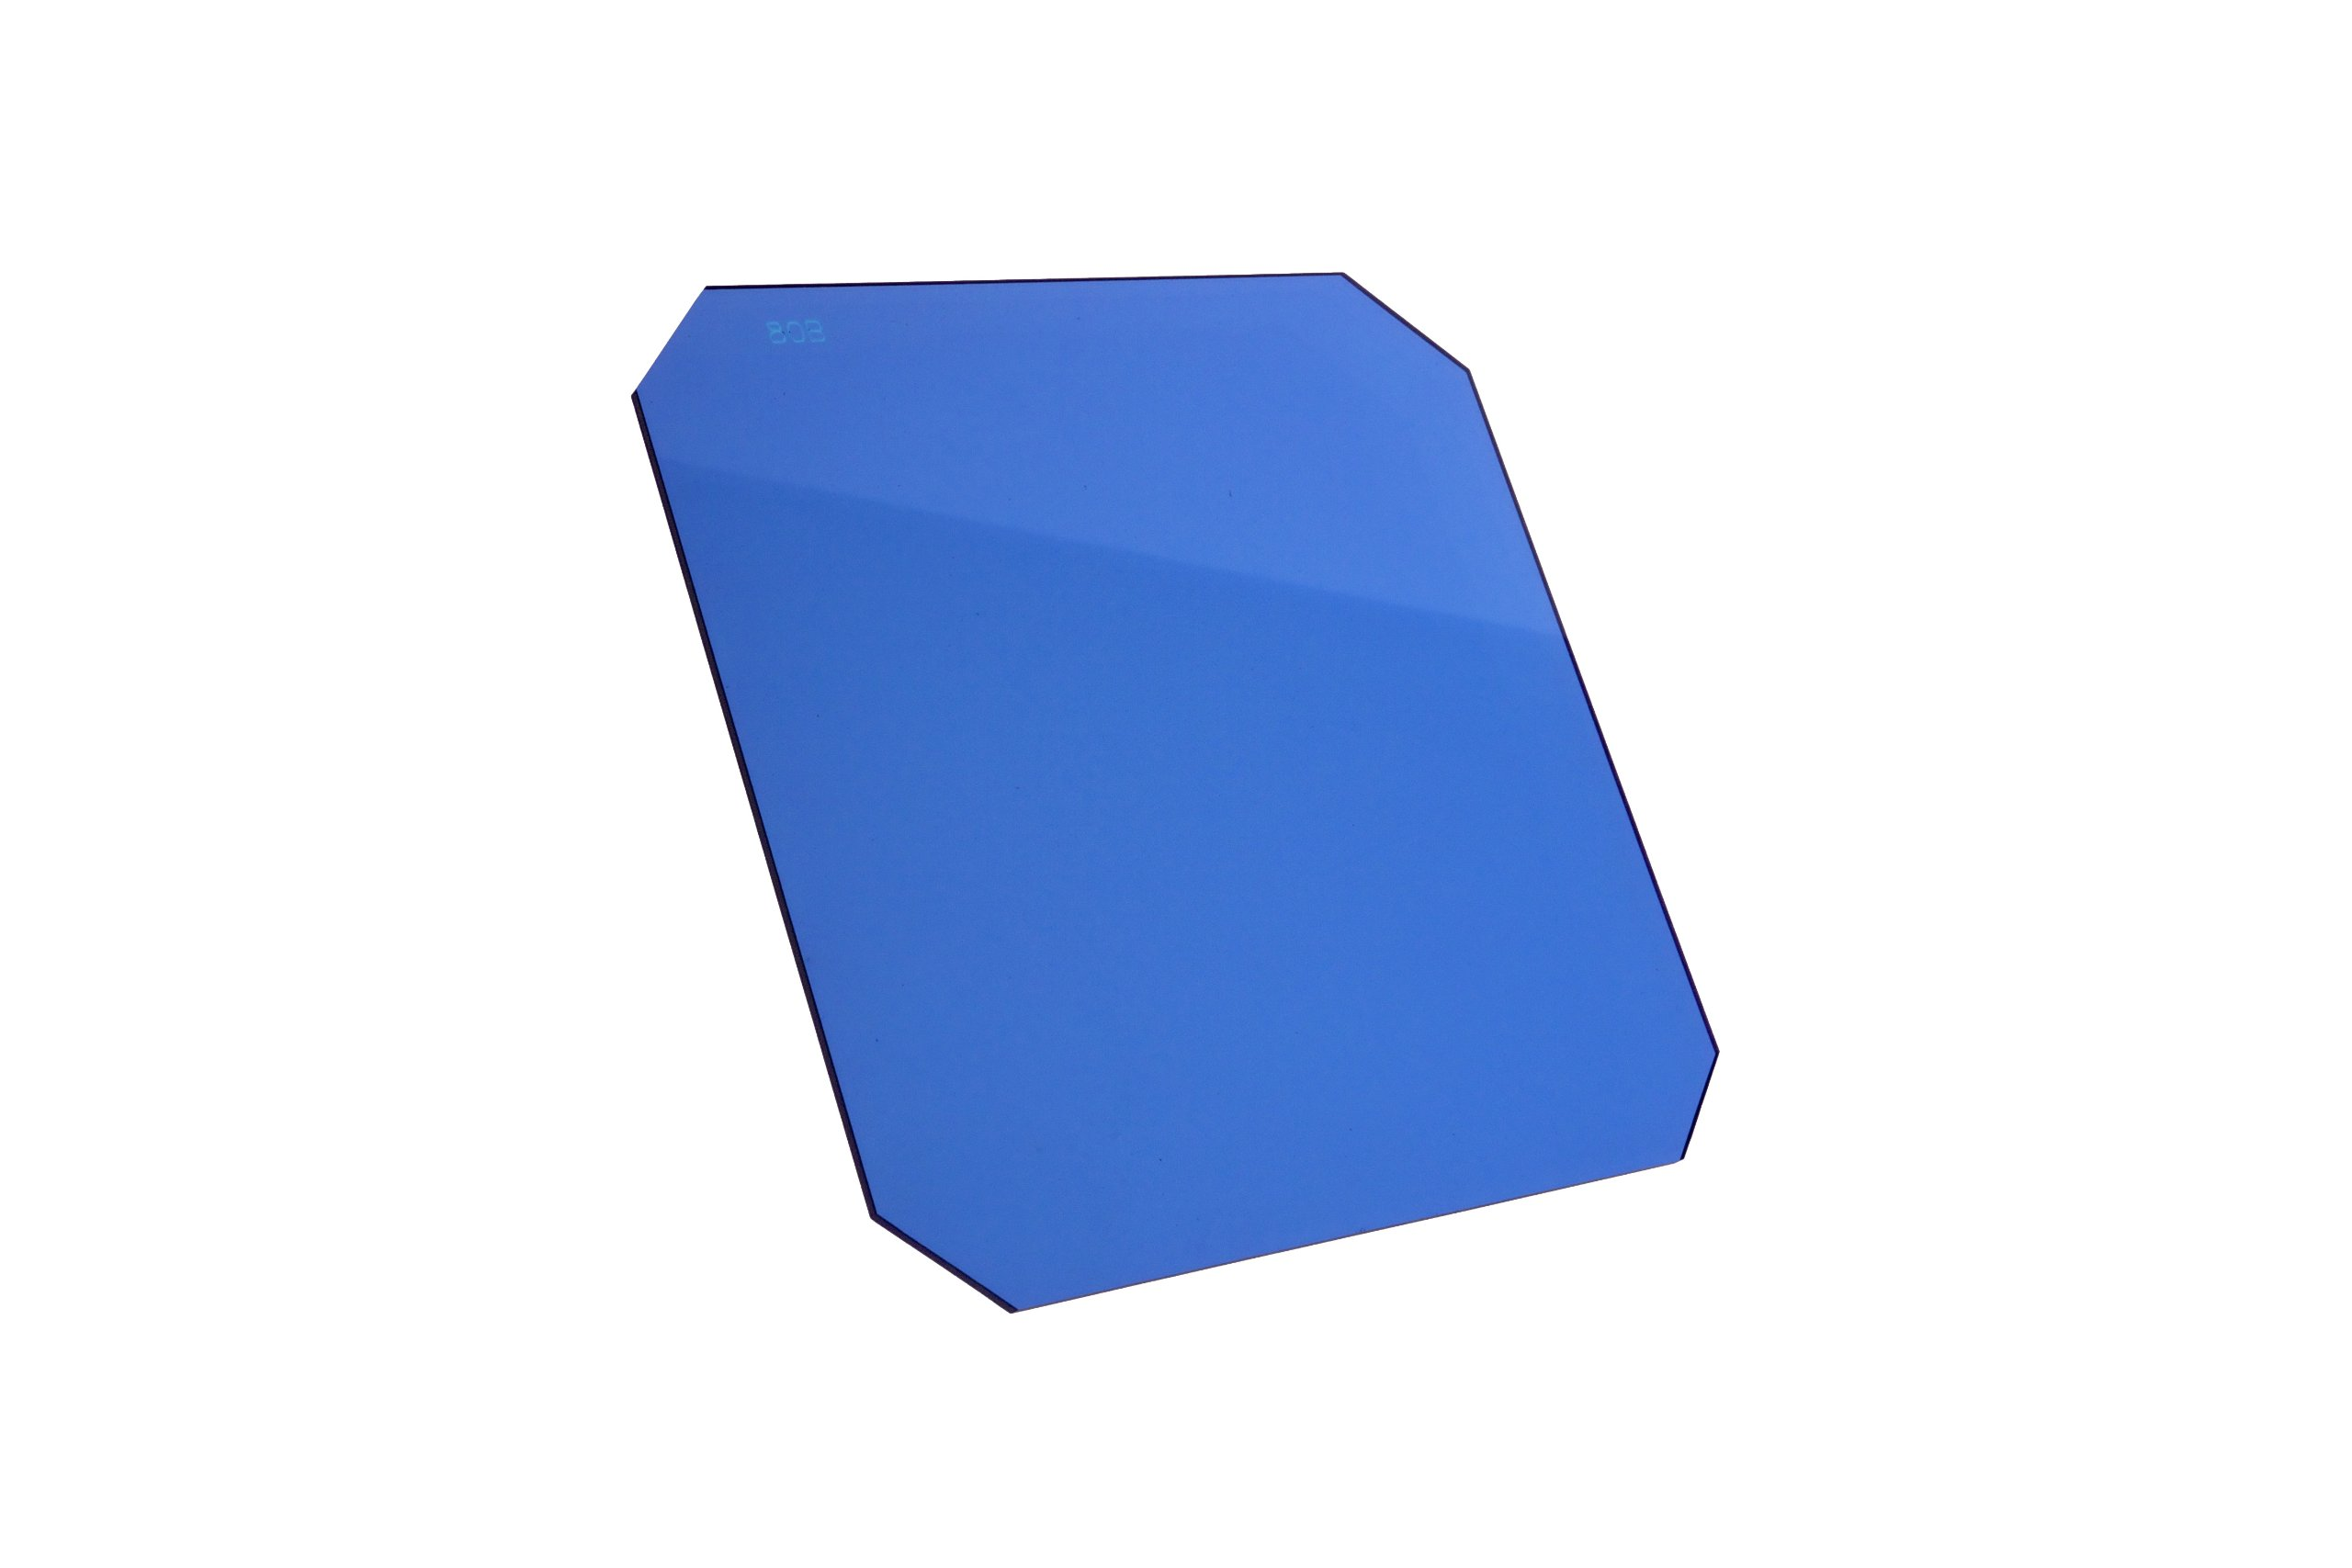 Formatt-Hitech 85x85mm (3.35x3.35'')Resin Color Temperature 80b